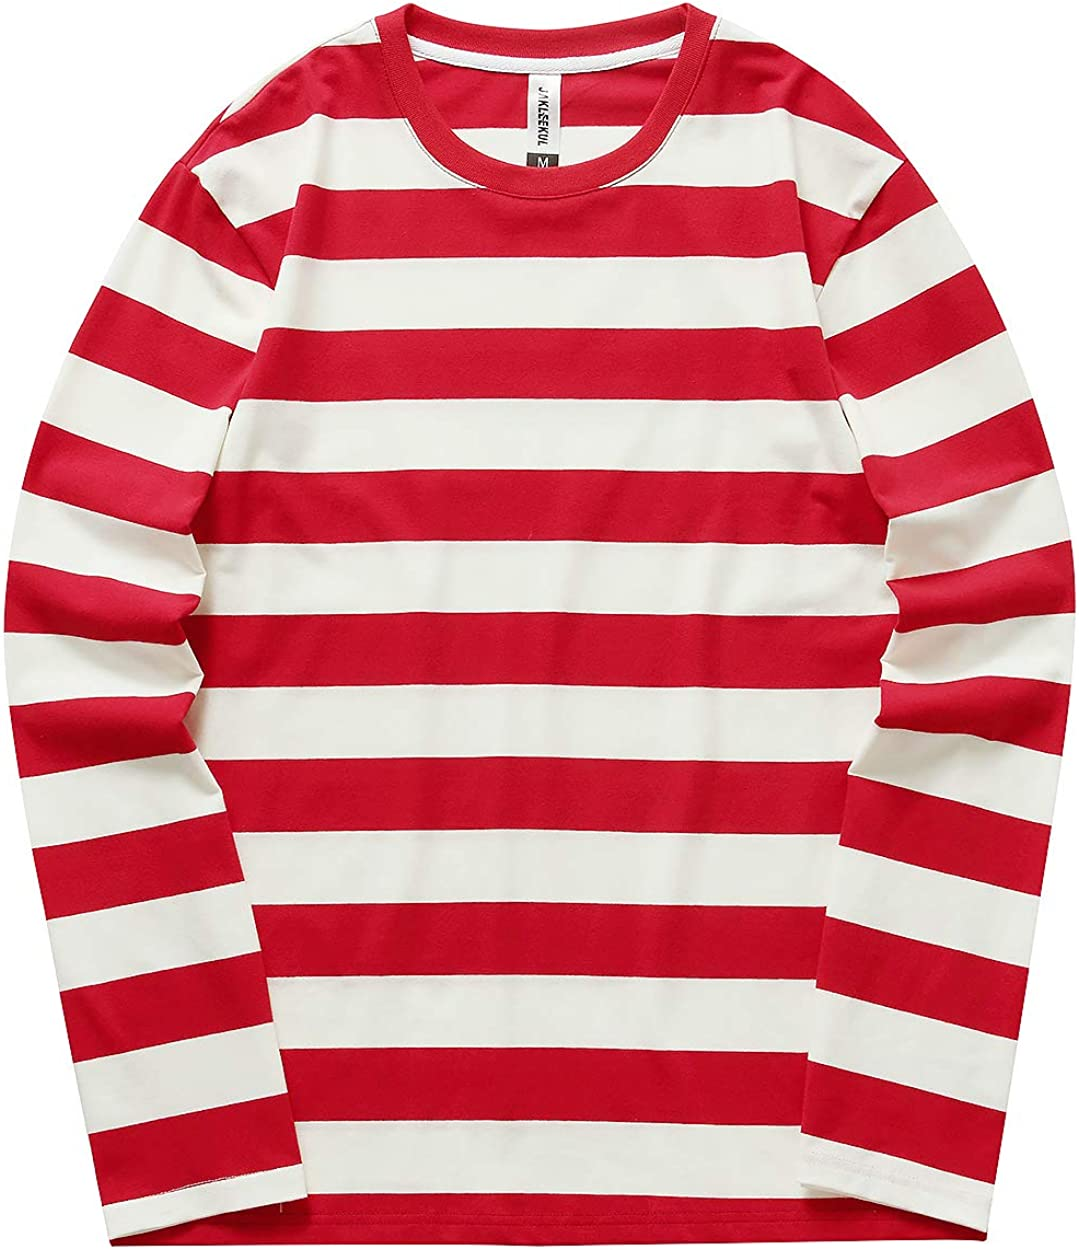 Syrirotus Year-end annual account Men's T-Shirt Casual Crewneck Long-awaited T-Shirts Basic Striped P